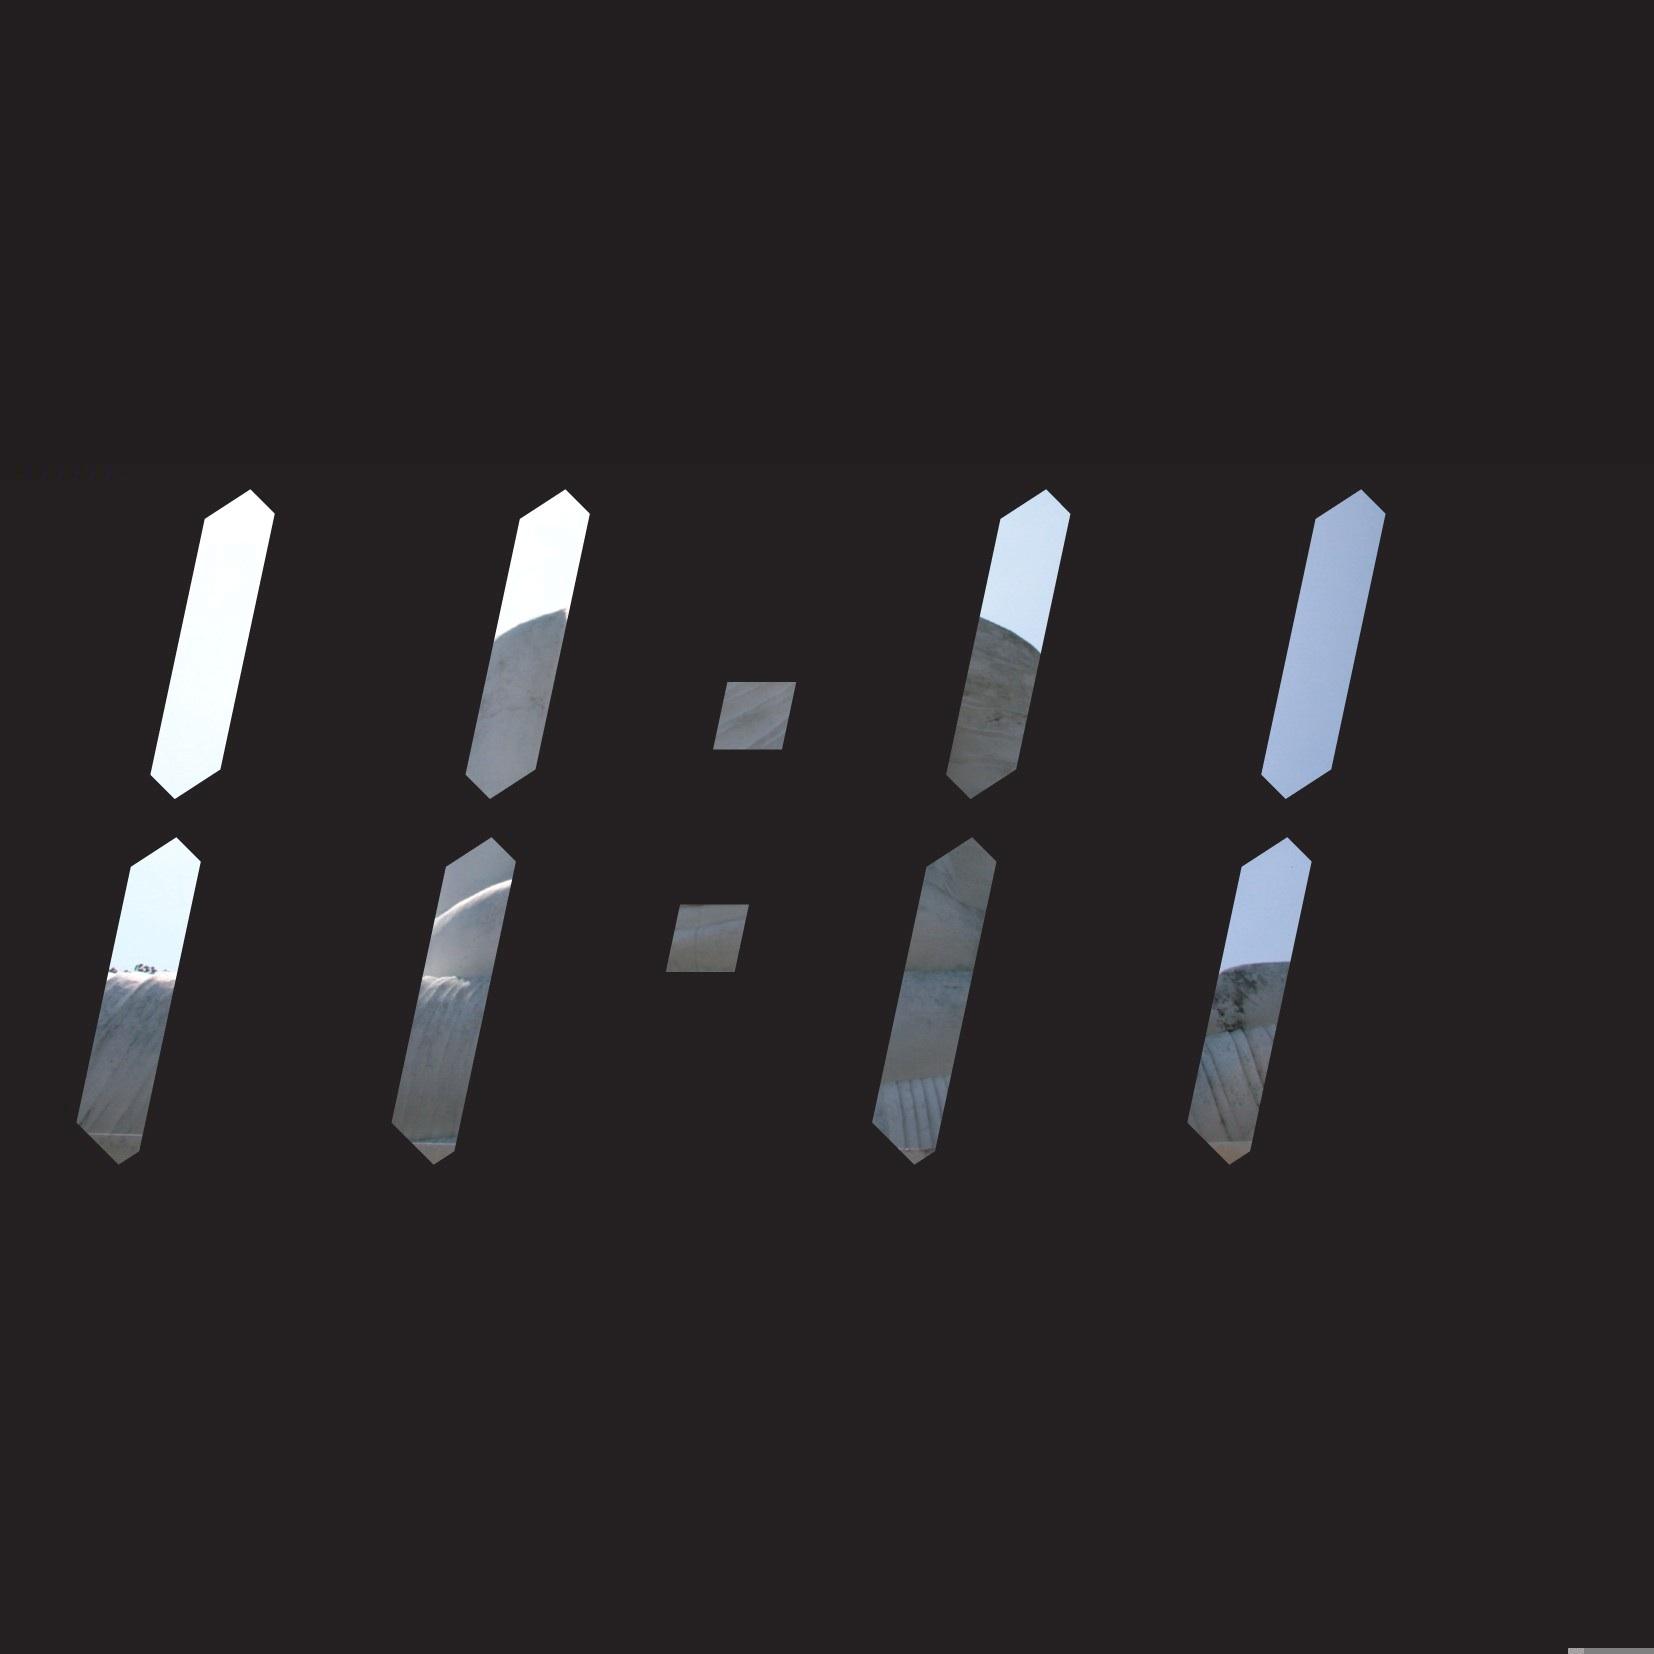 ���� �������� 11.11 �������